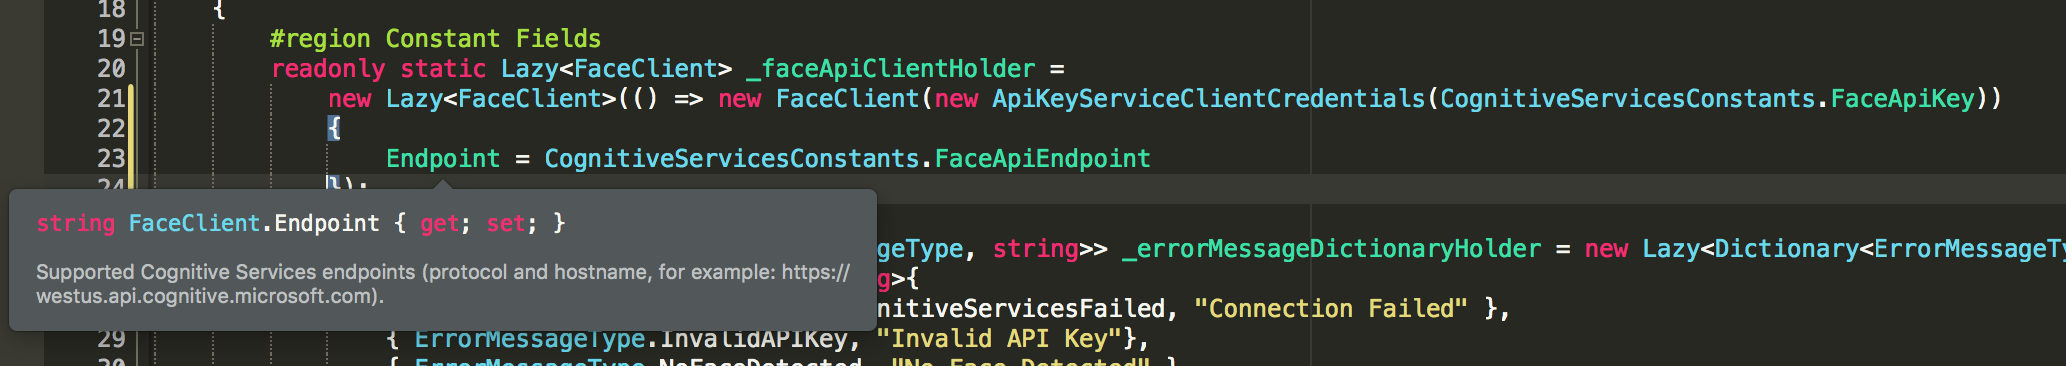 Inconsistent Nomenclature Between Azure Portal and SDKs